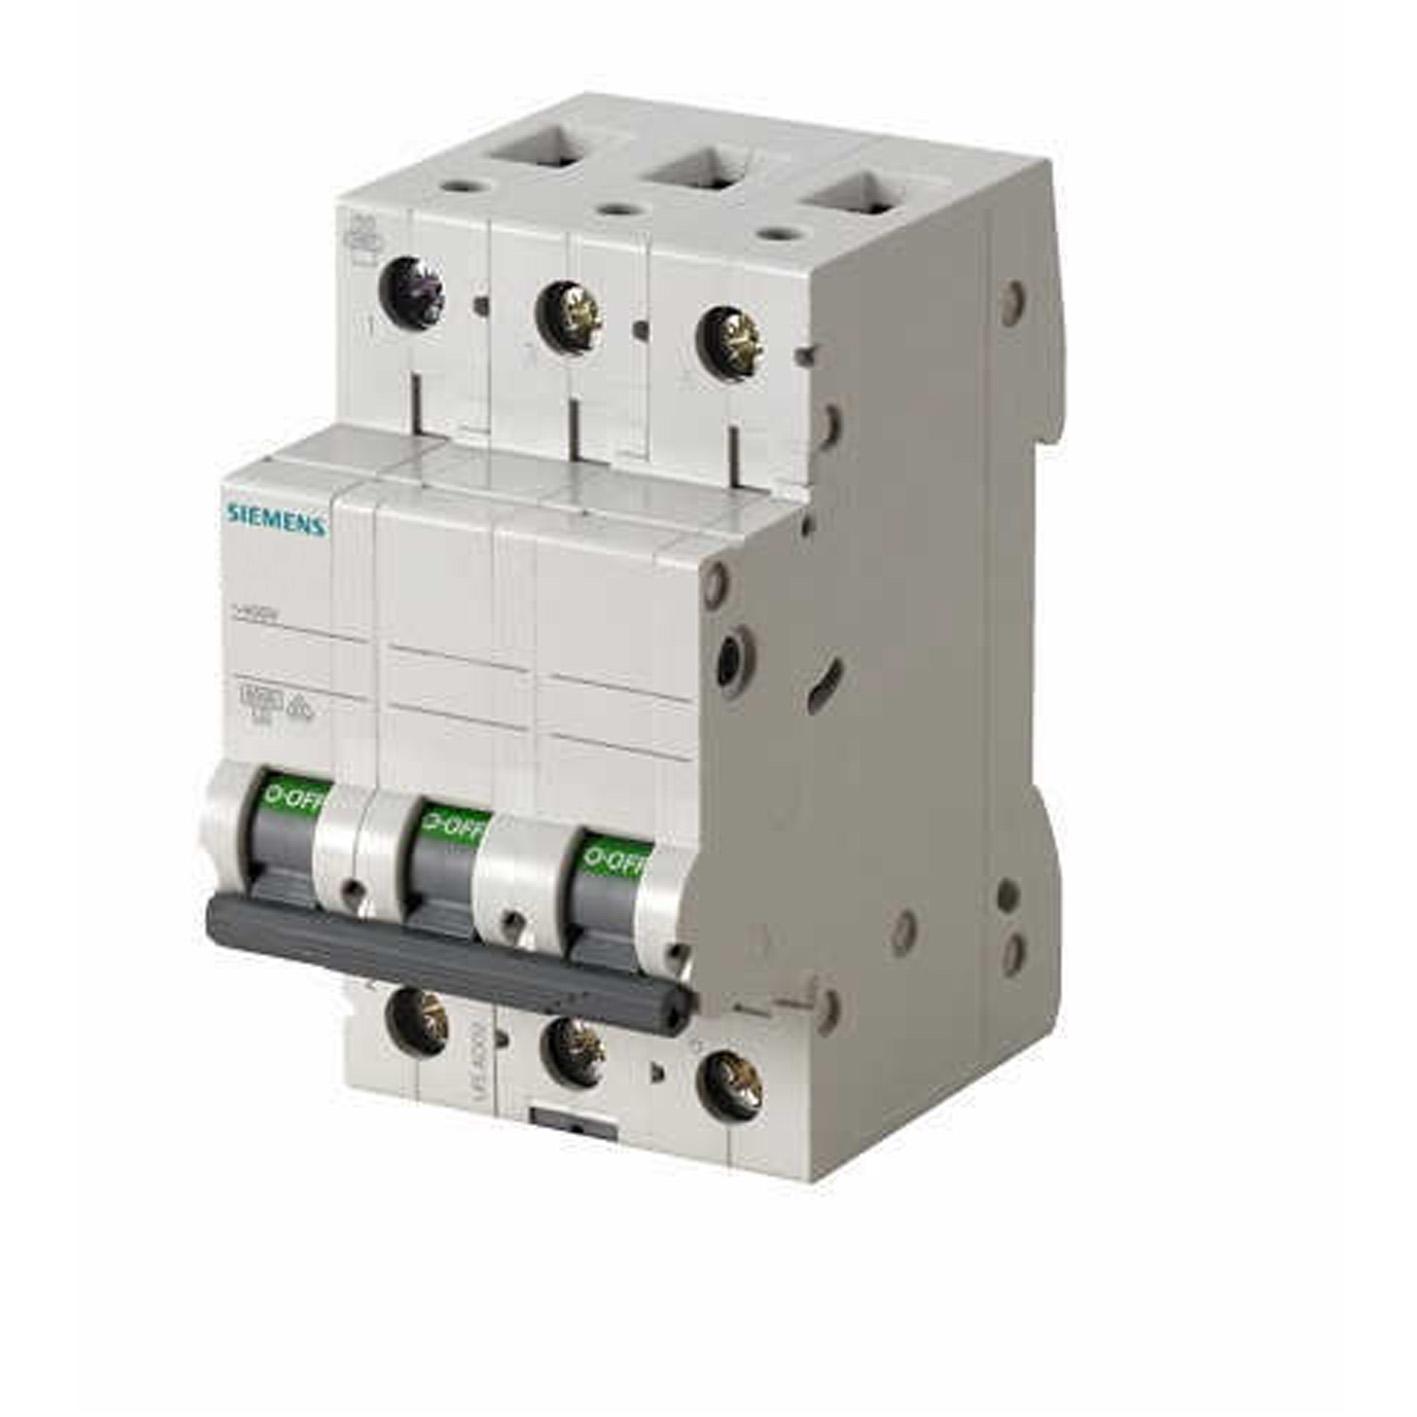 Siemens 3x100A Otomatik Sigorta